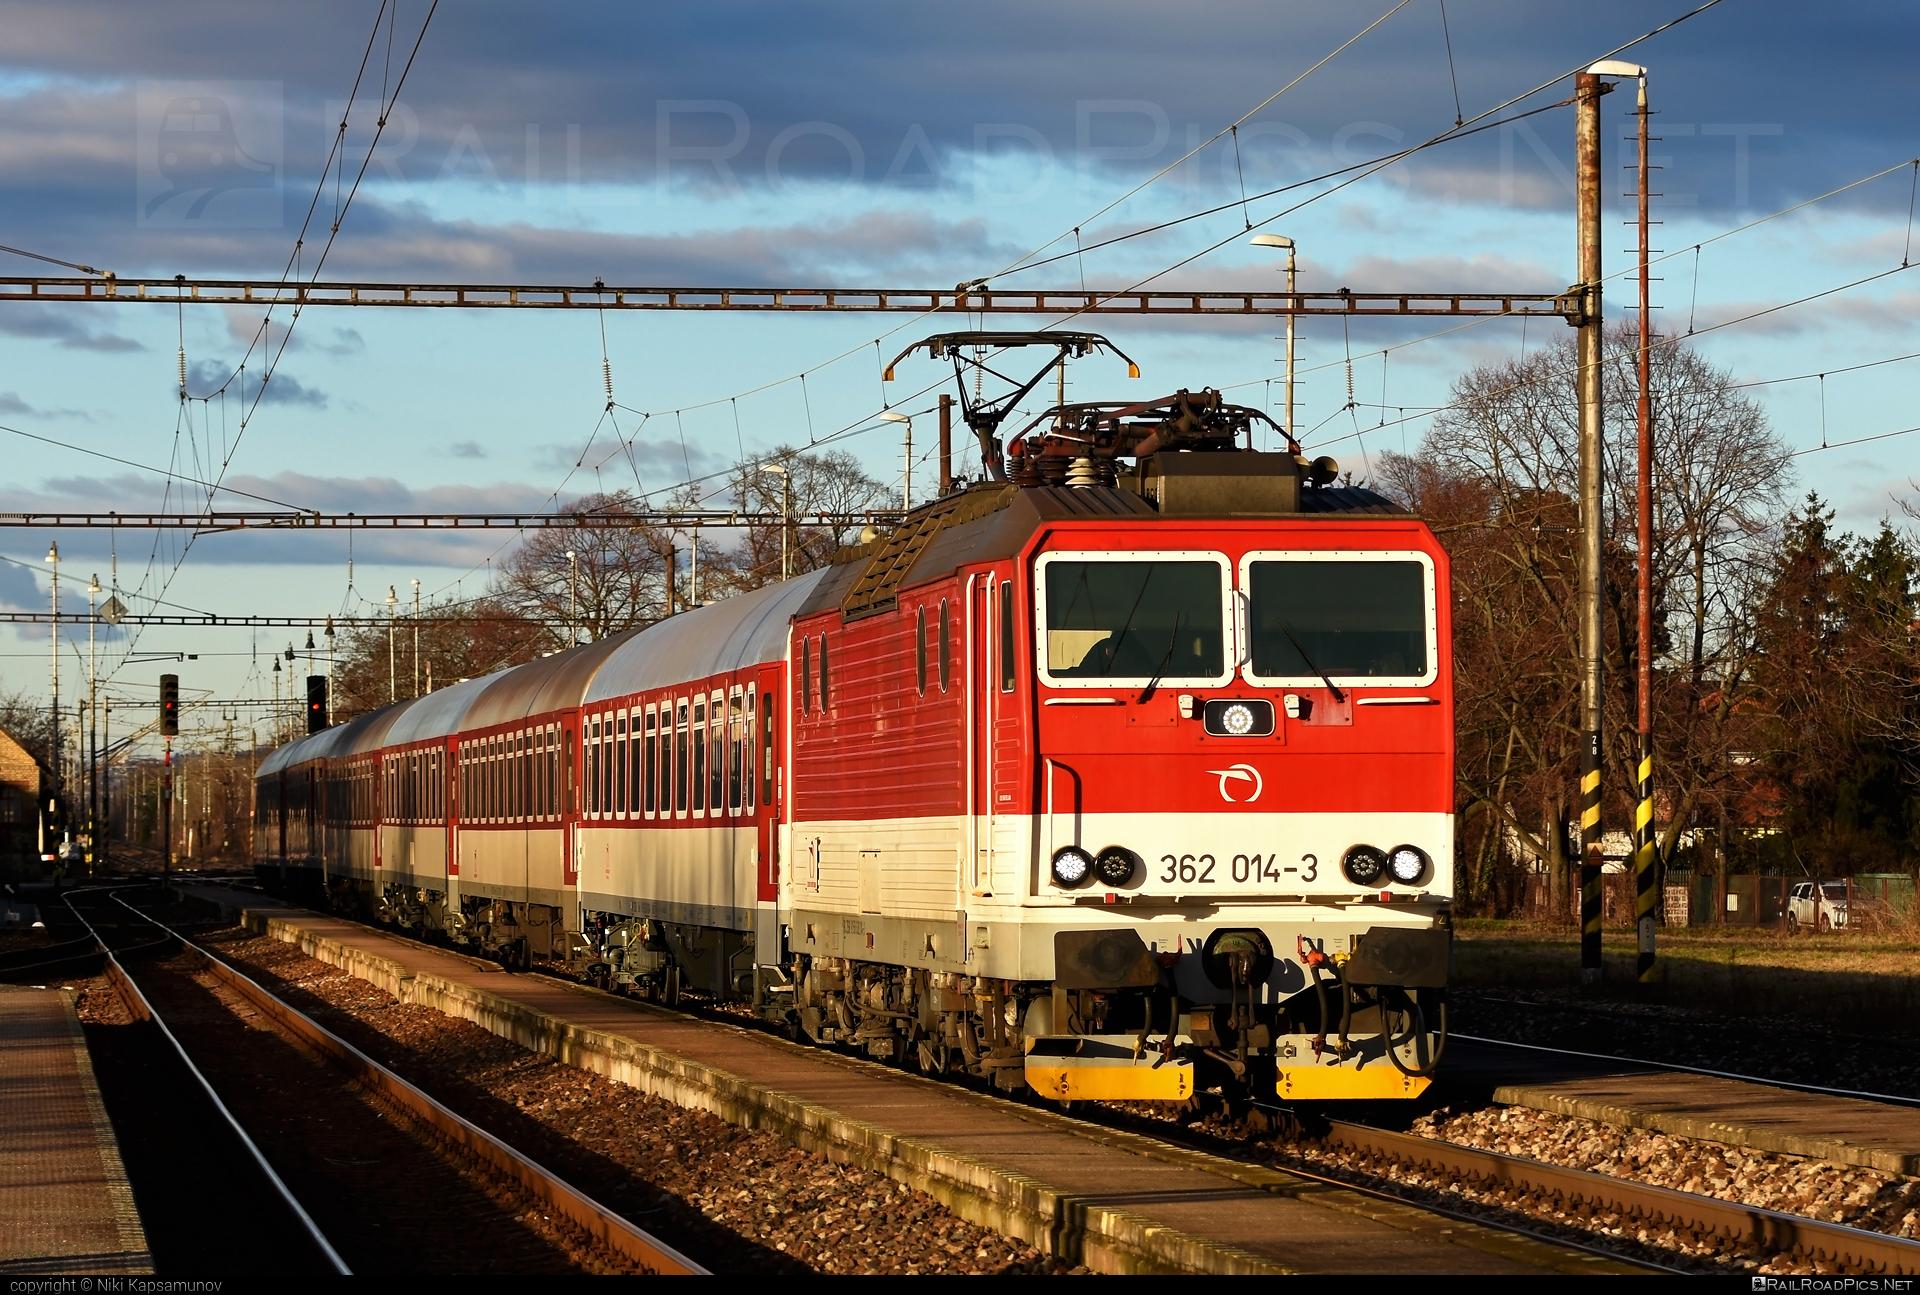 Škoda 69Er - 362 014-3 operated by Železničná Spoločnost' Slovensko, a.s. #ZeleznicnaSpolocnostSlovensko #eso #locomotive362 #rychleeso #skoda #skoda69er #zssk